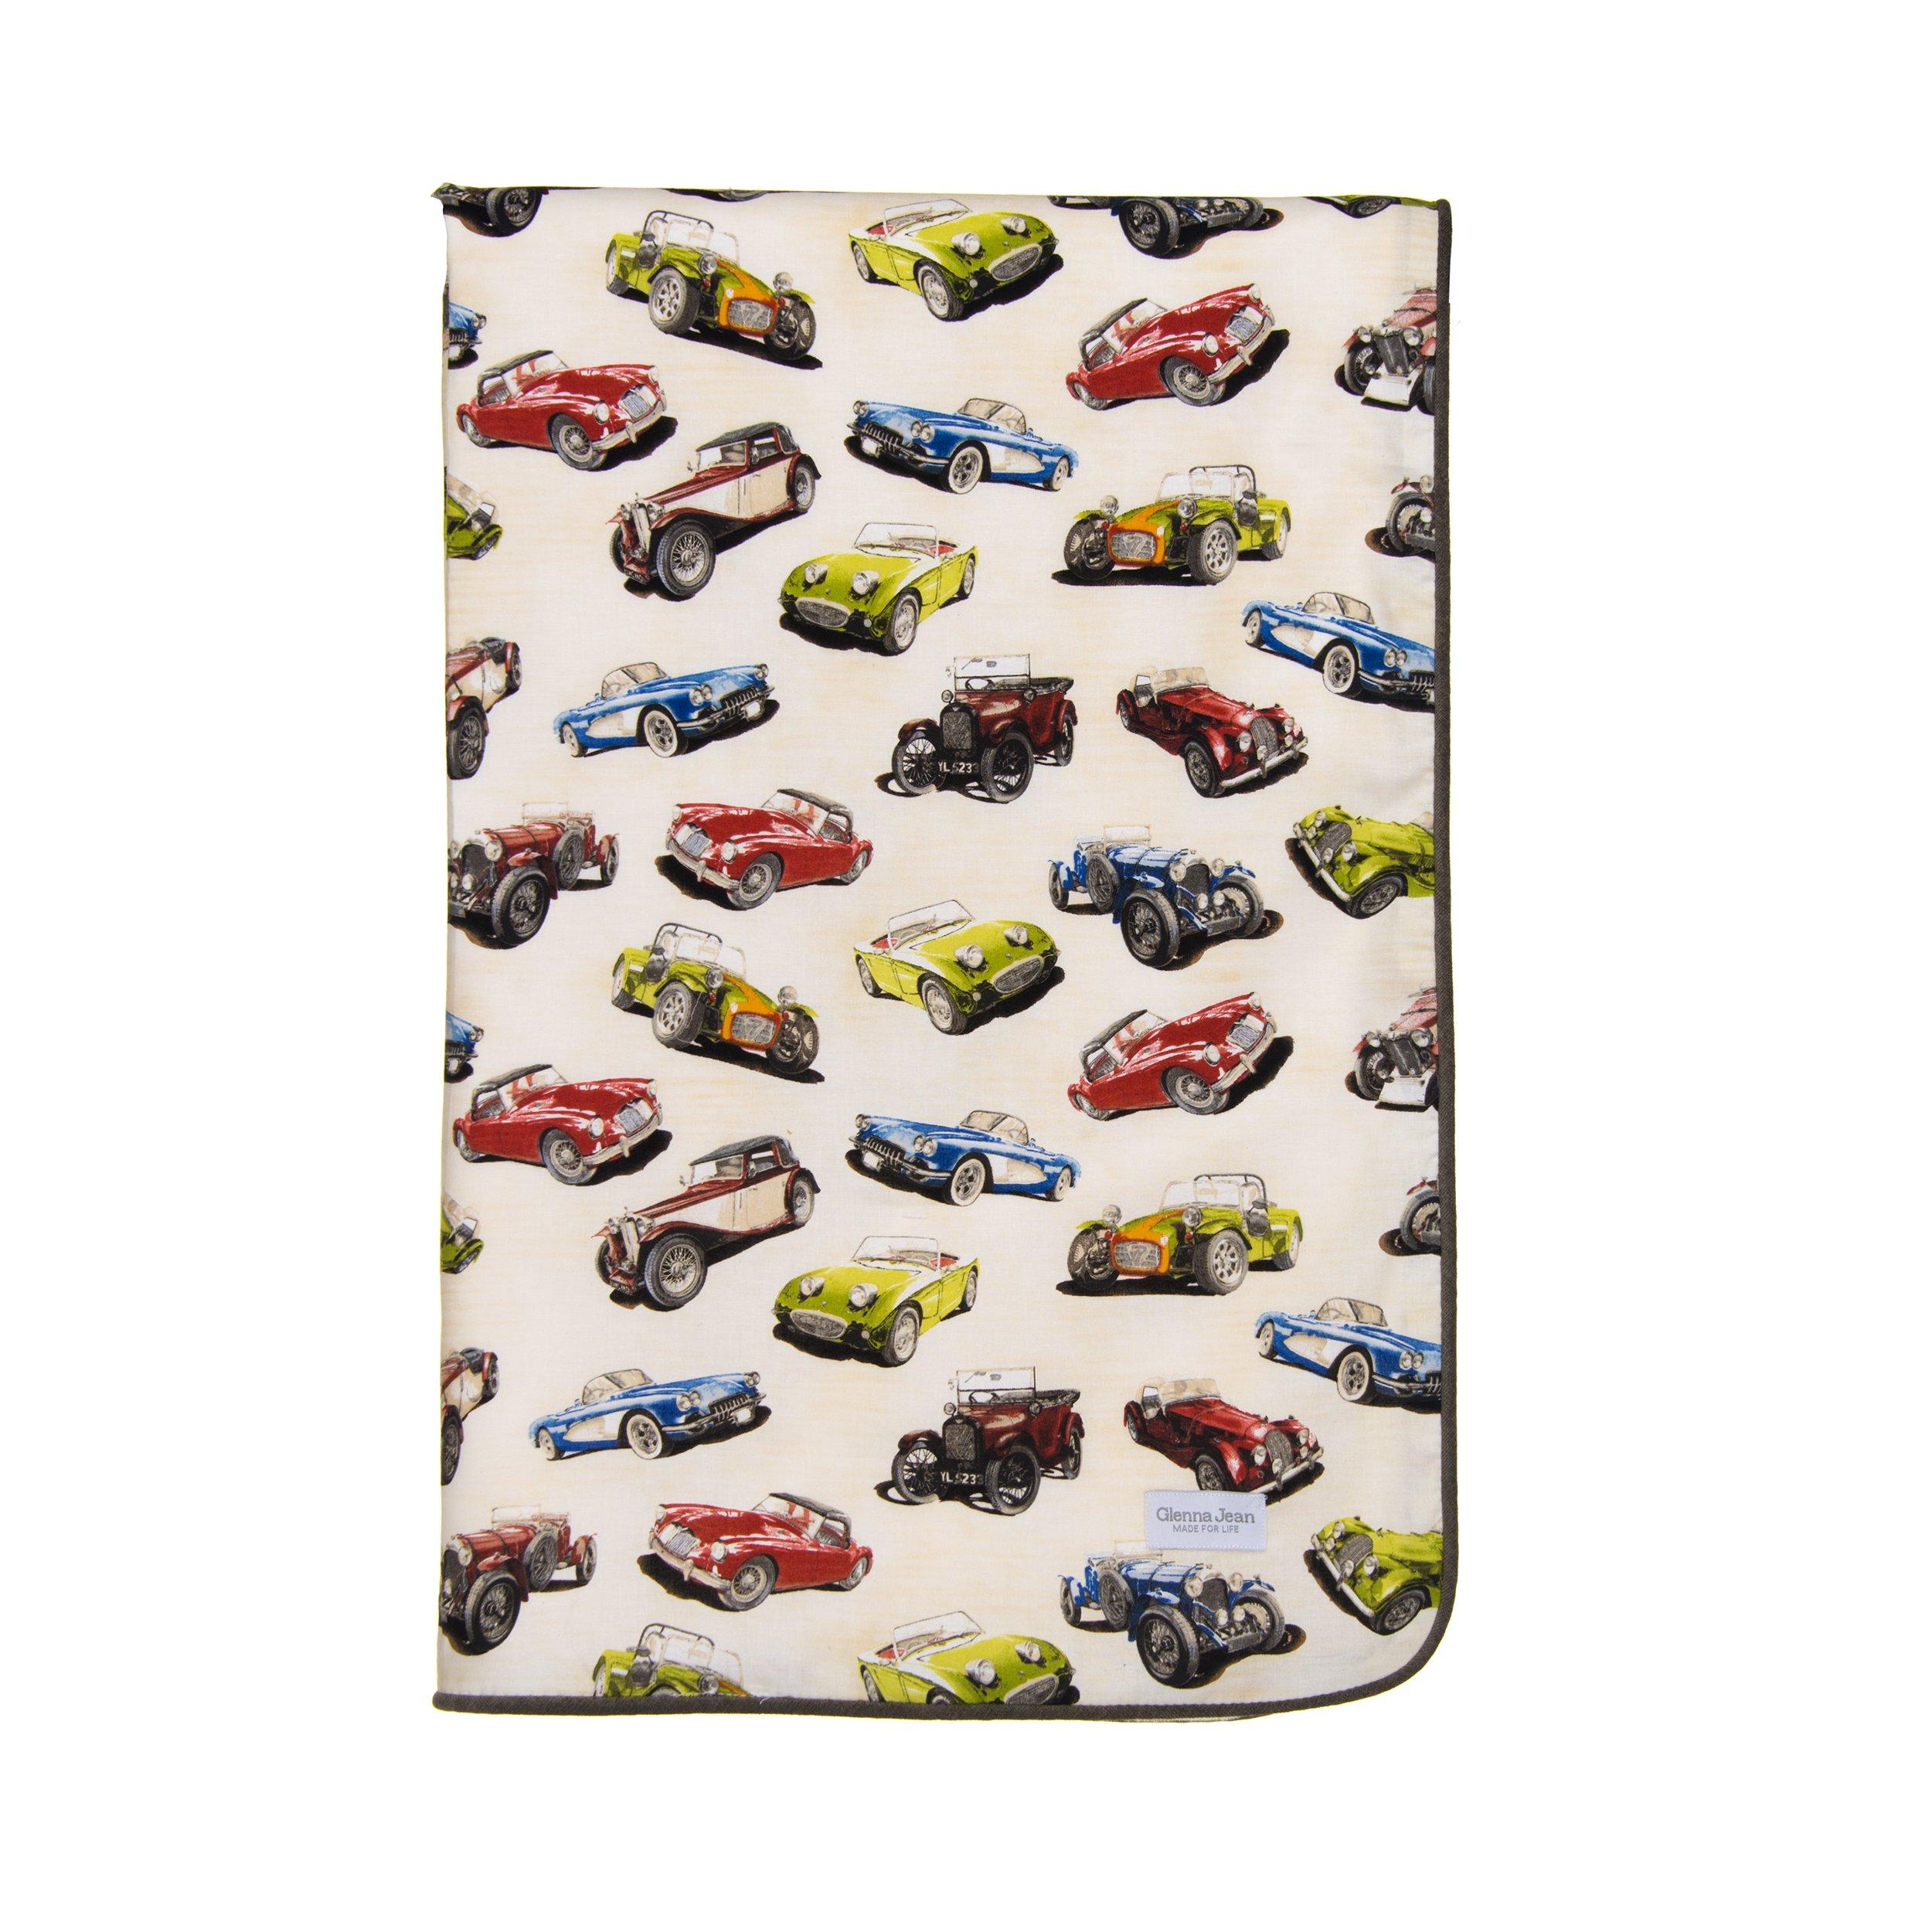 Glenna Jean Fast Track Quilt, Cars